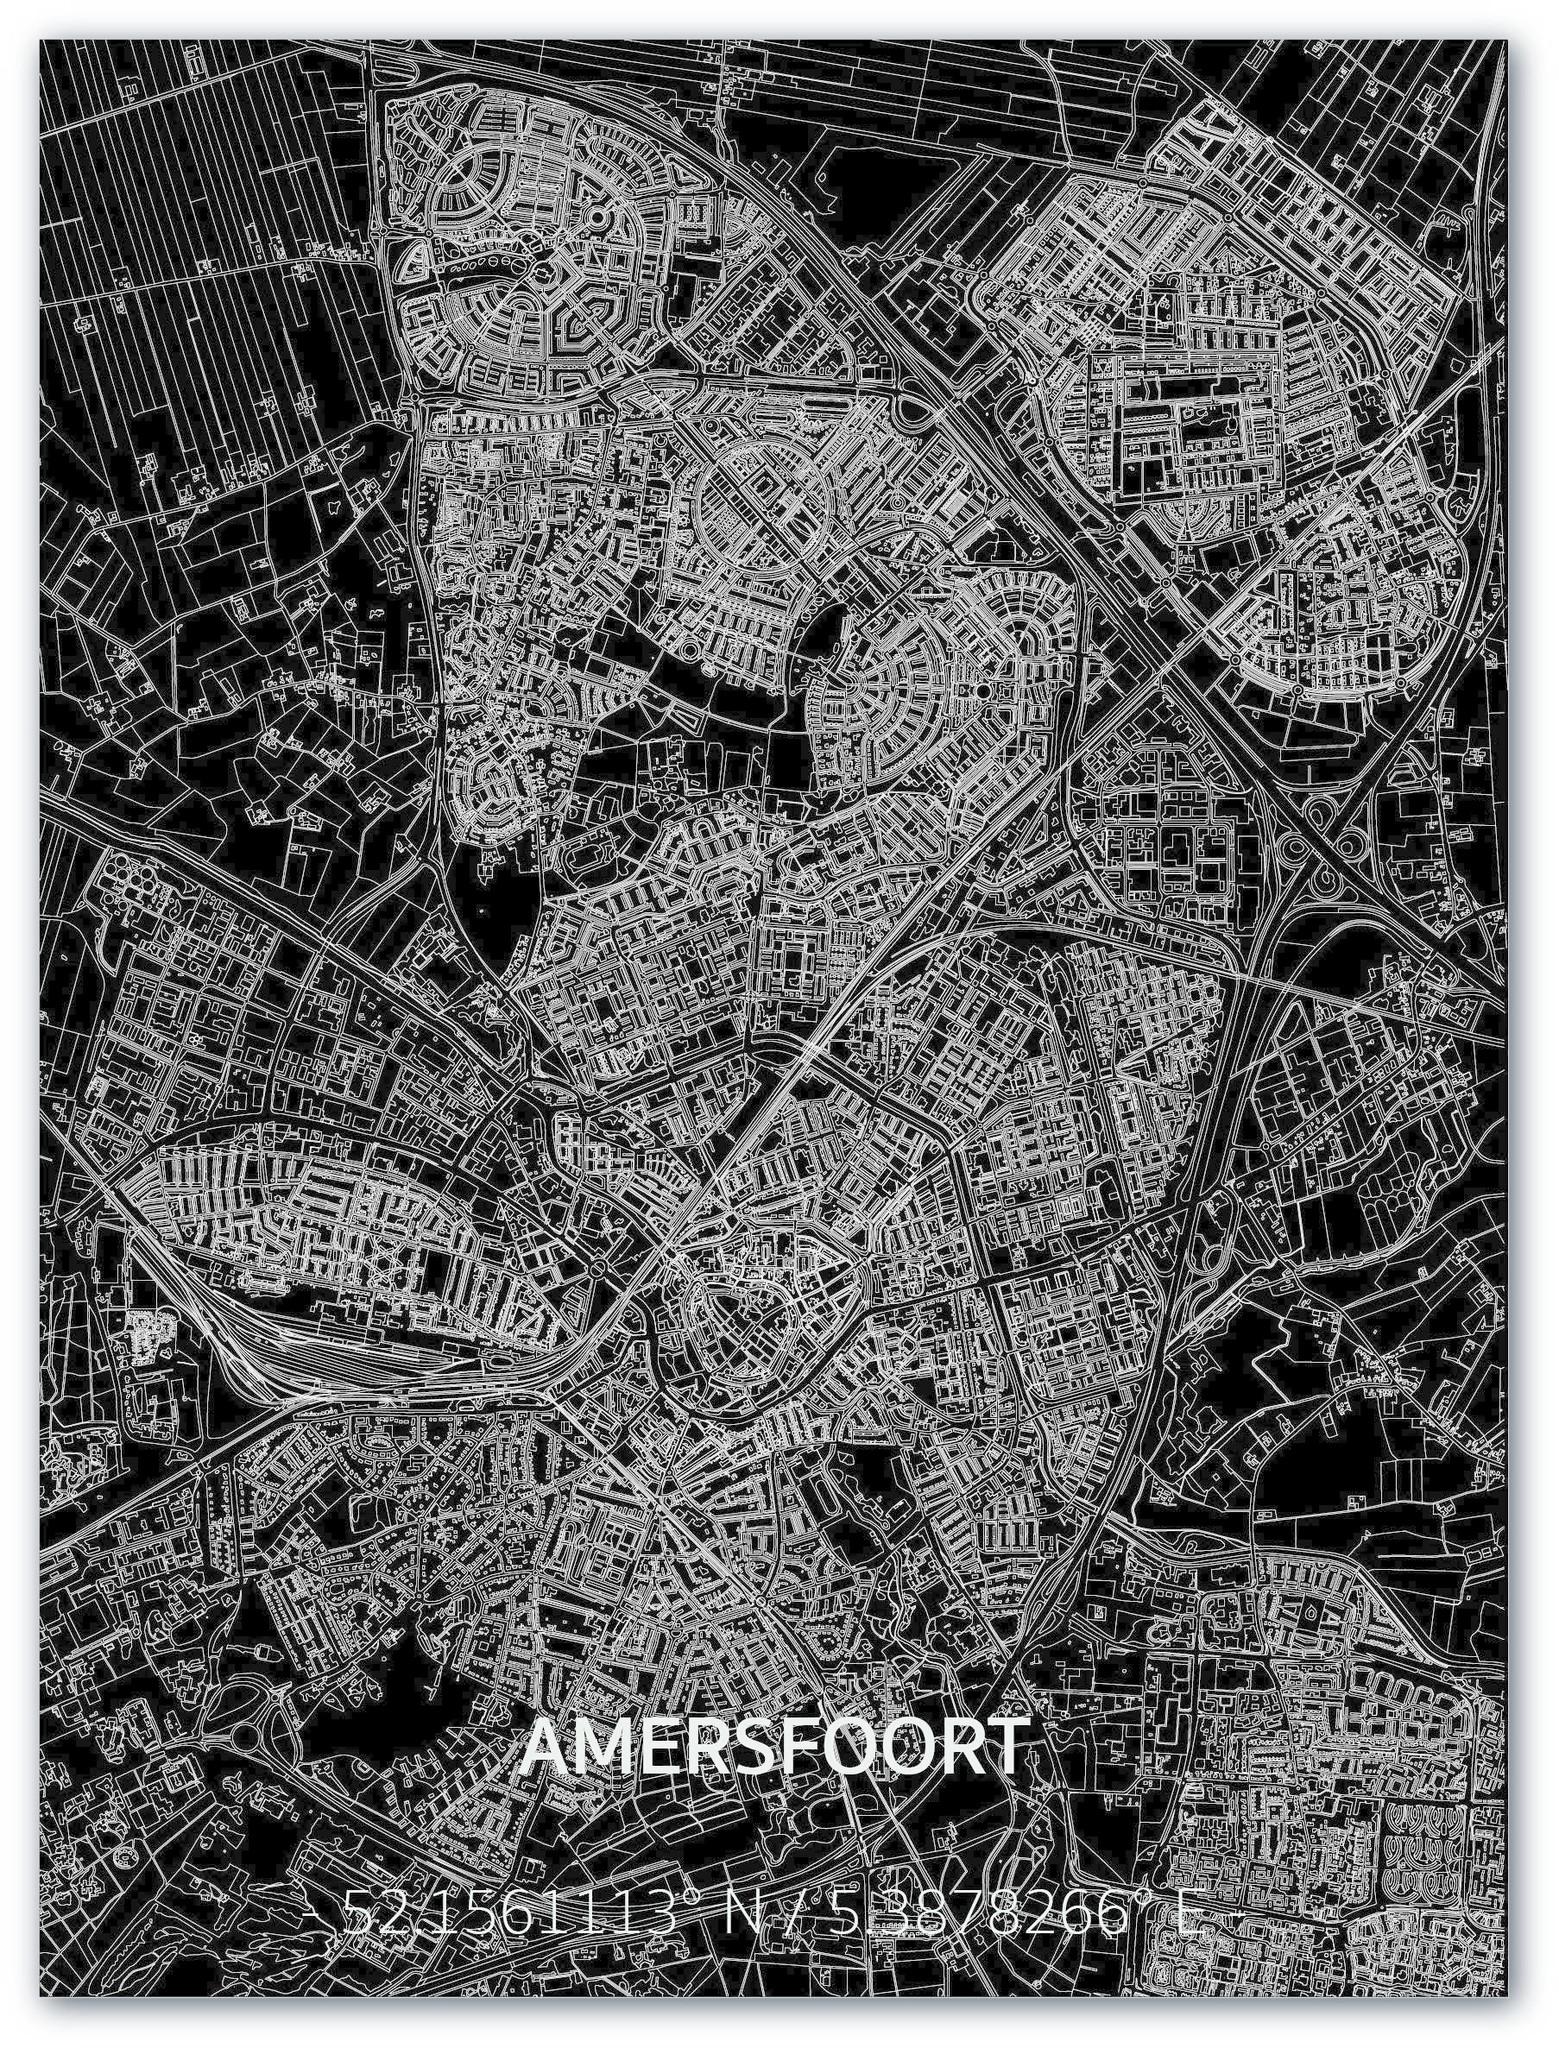 Stadtkarte Amersfoort | Aluminium Wanddekoration-1